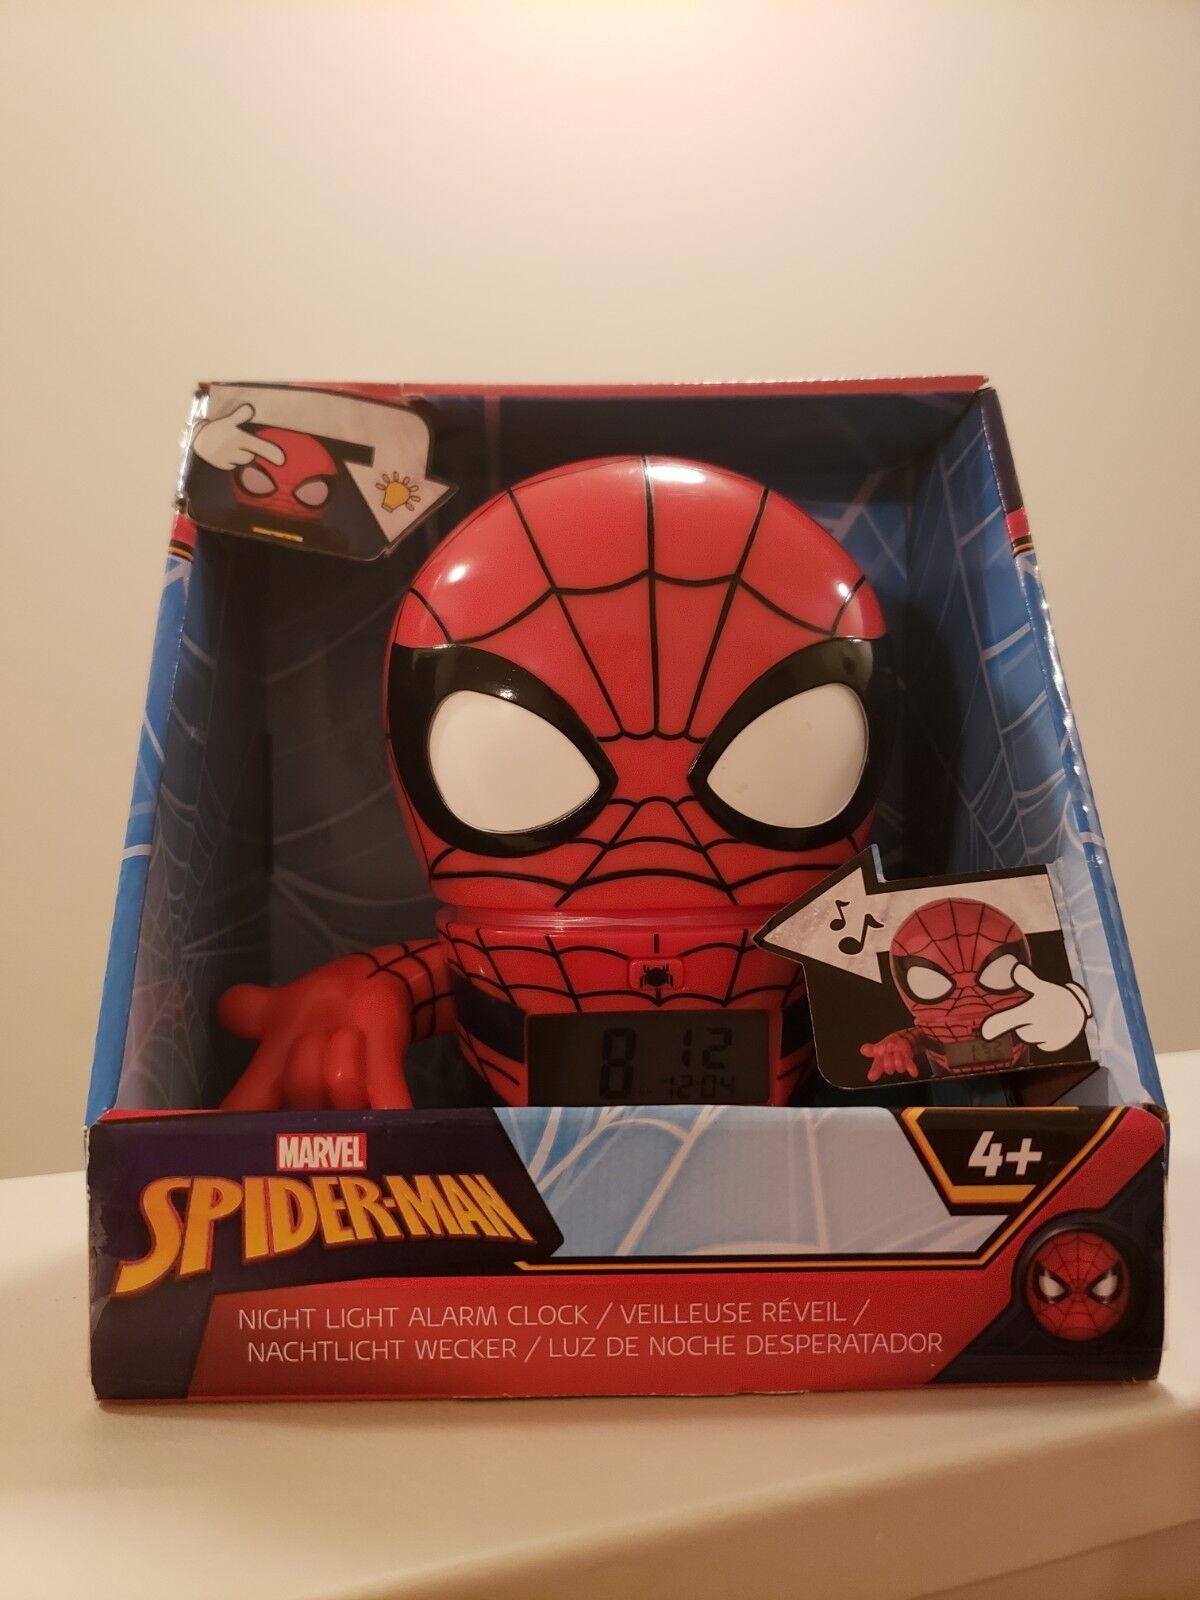 Marvel Spider-man Night Light Alarm Clock BulbBotz NEW in Box